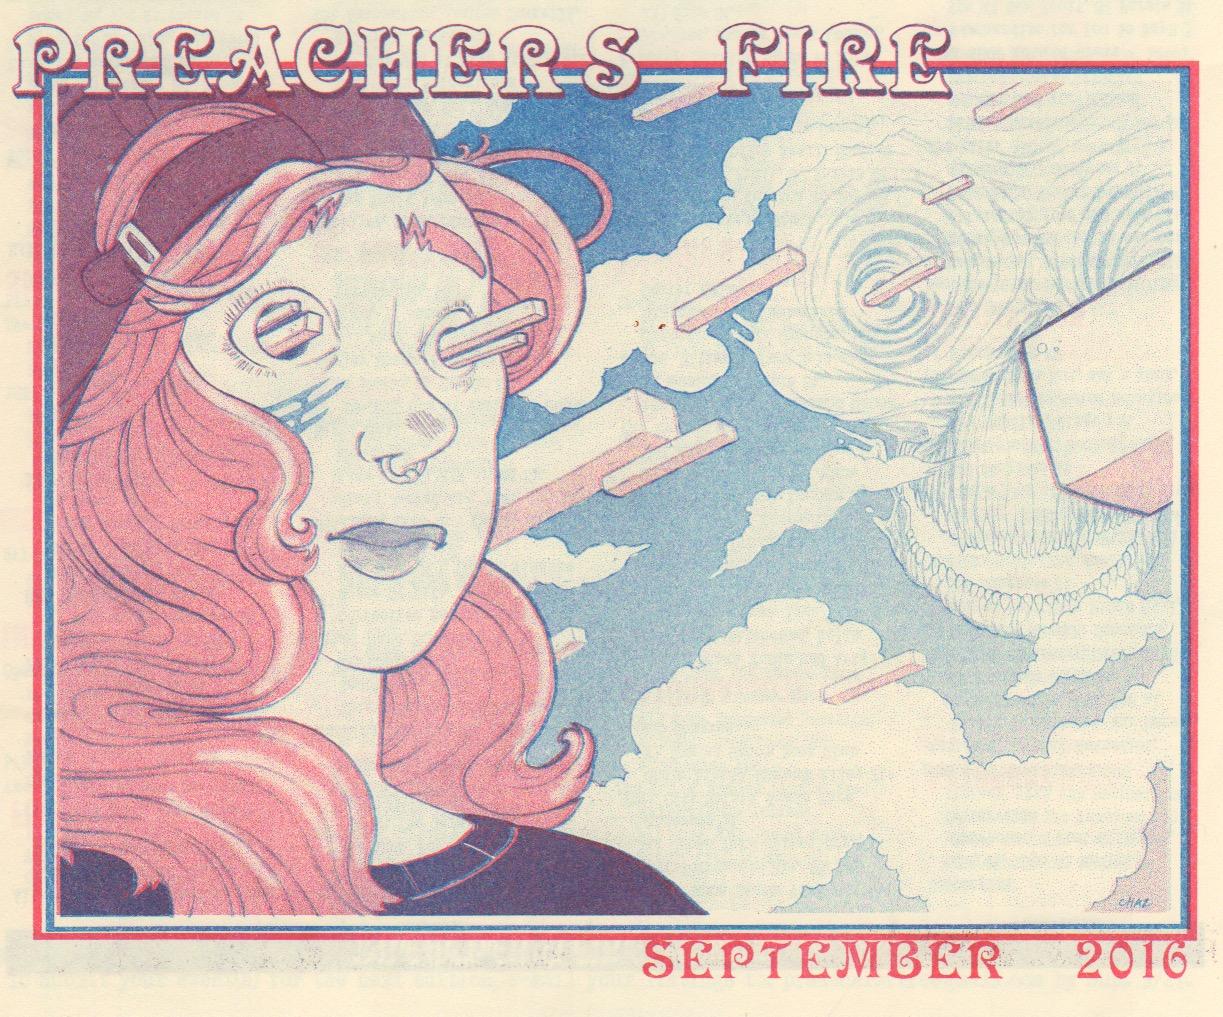 Preacher's Fire September 2016 Cover